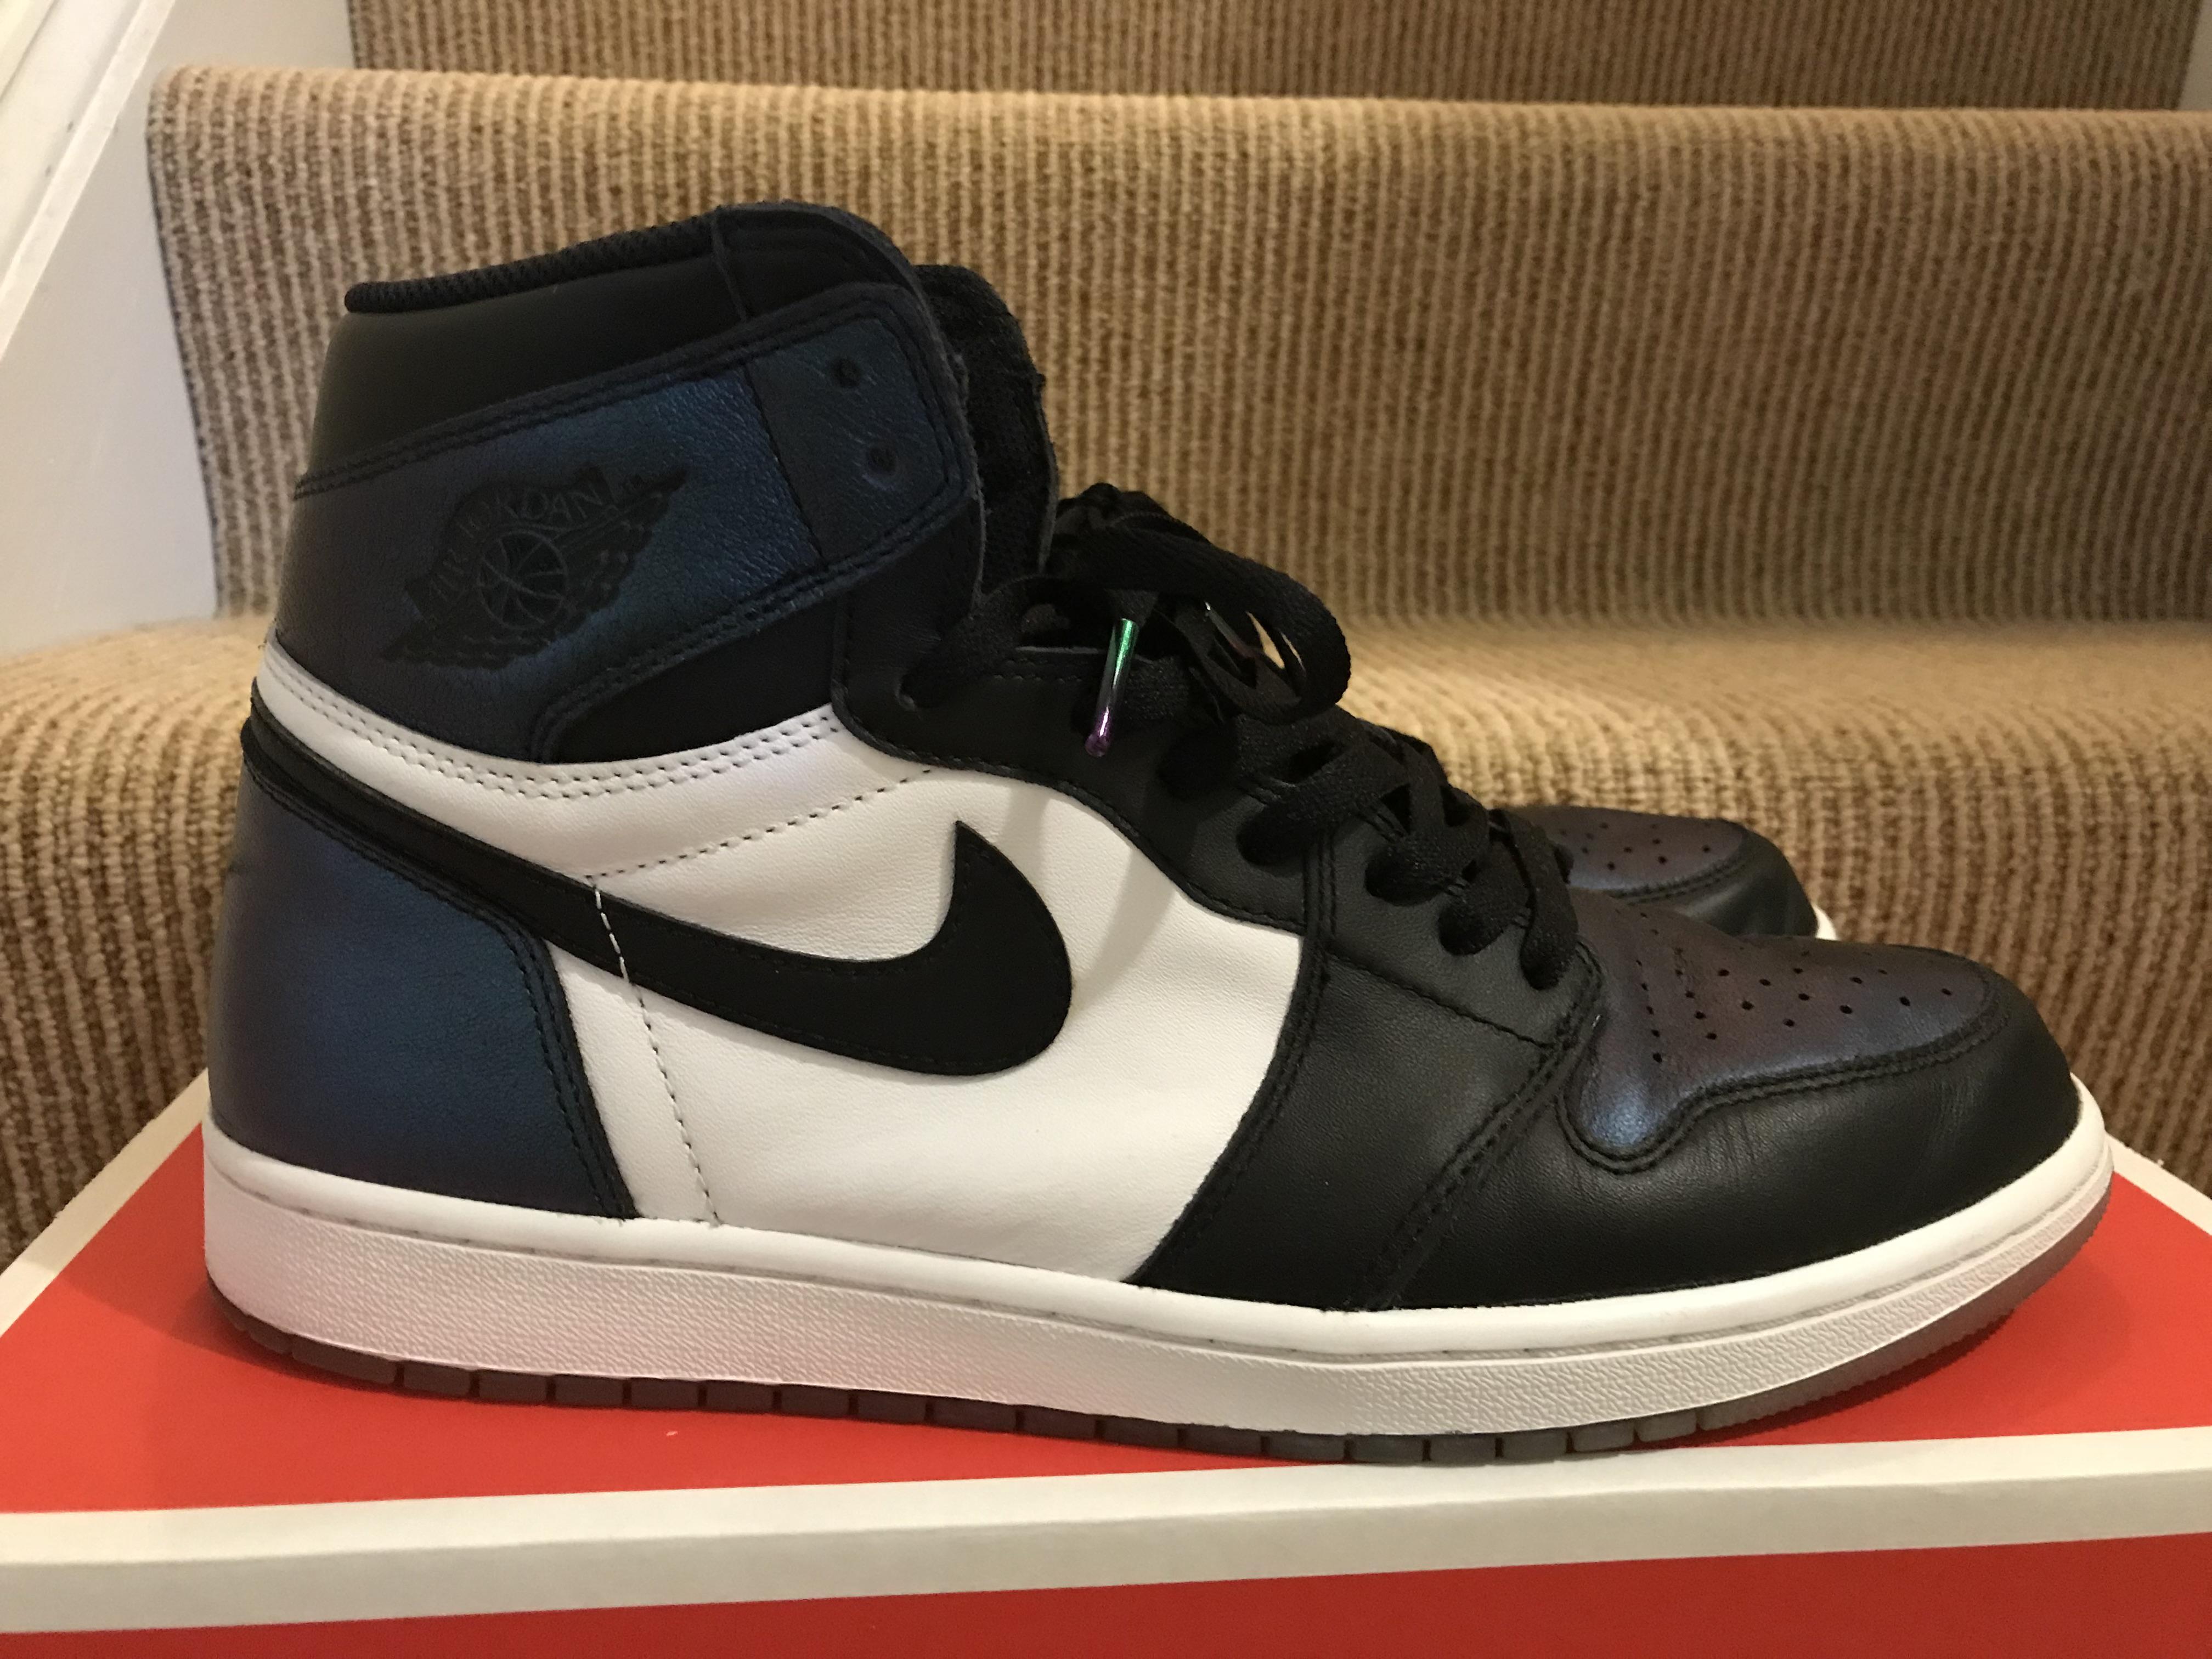 0ab1fa9f46a0f0 Nike All Star Air Jordan 1 Retro High Nike Hi Chameleon Size 11.5 ...